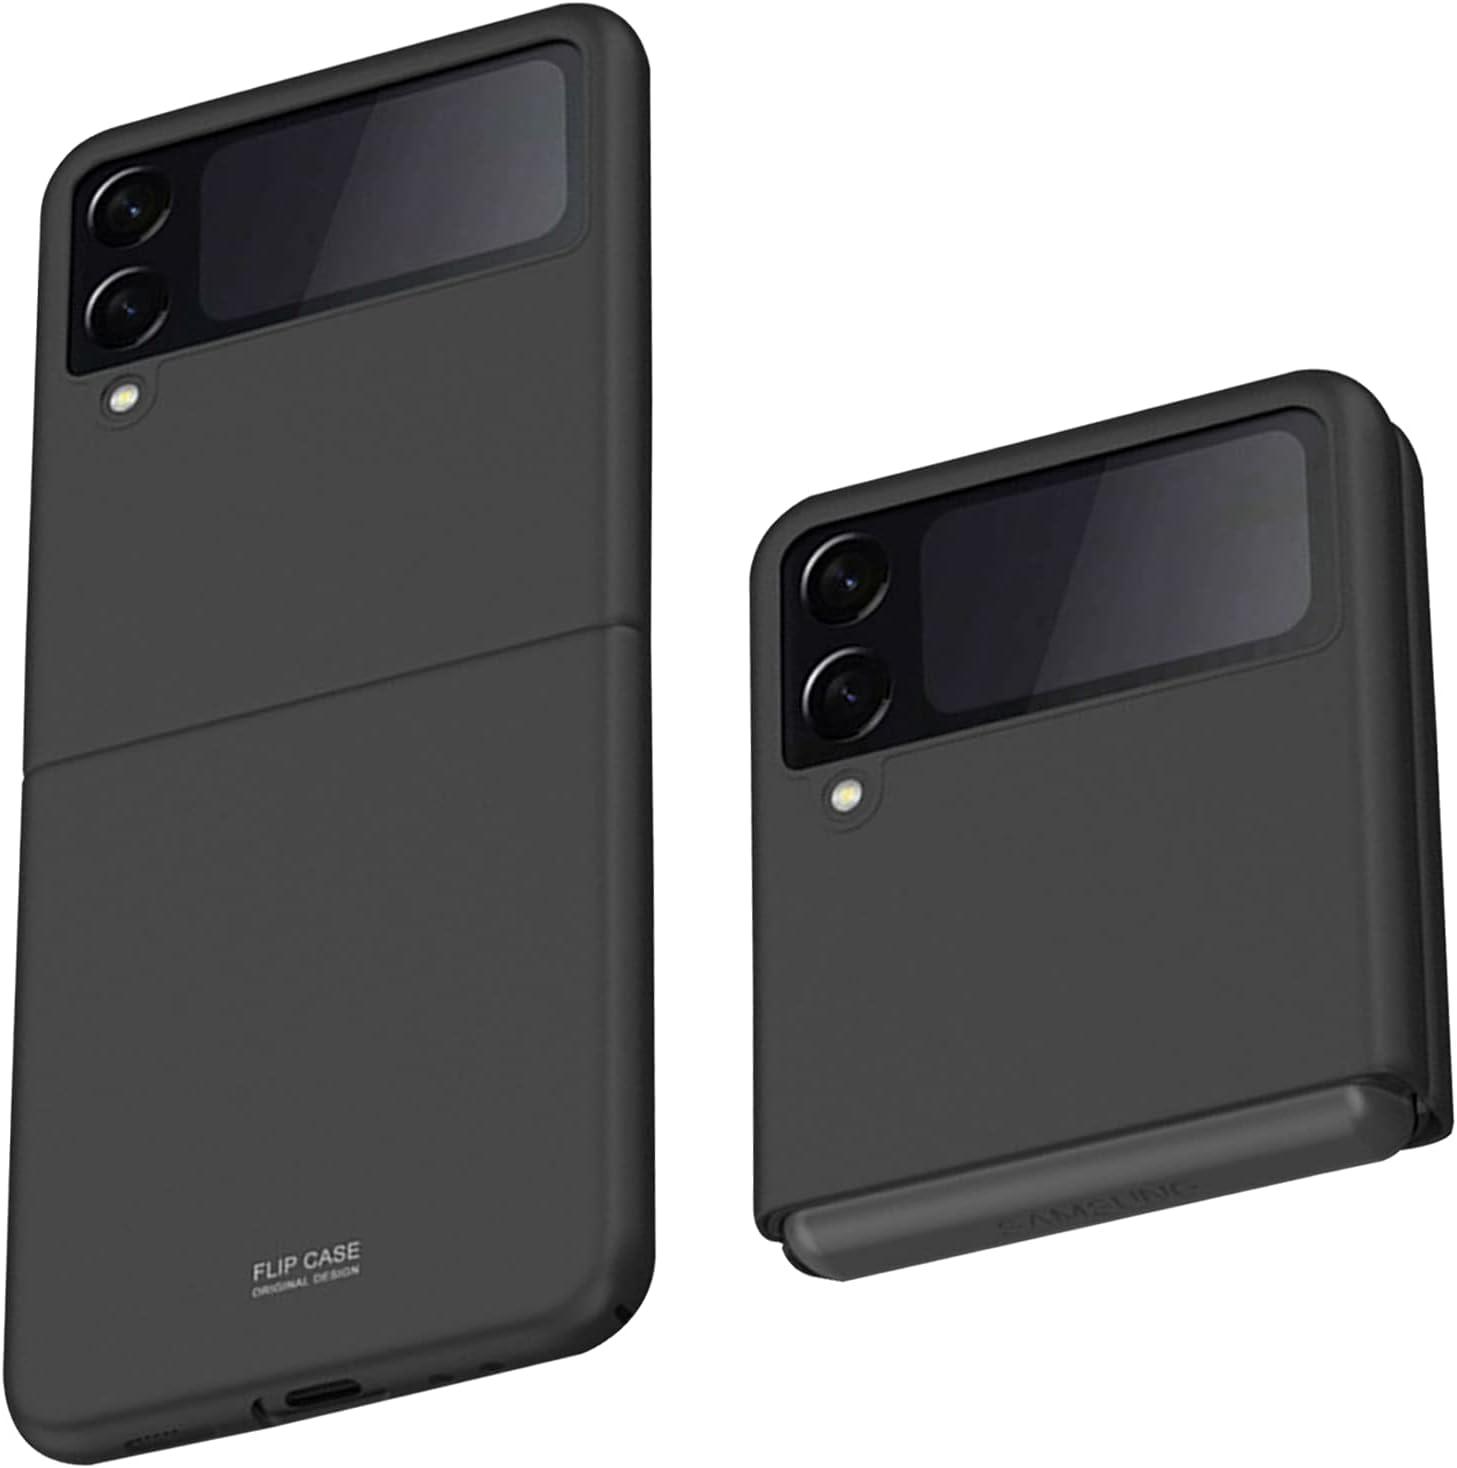 Z Flip 3 Case, Slim fit Samsung z flip 3 case 5G Phone Case Full Protection Cover Hard PC Shockproof Durable Protective Phone Cover for Z Flip3 5G (Black)